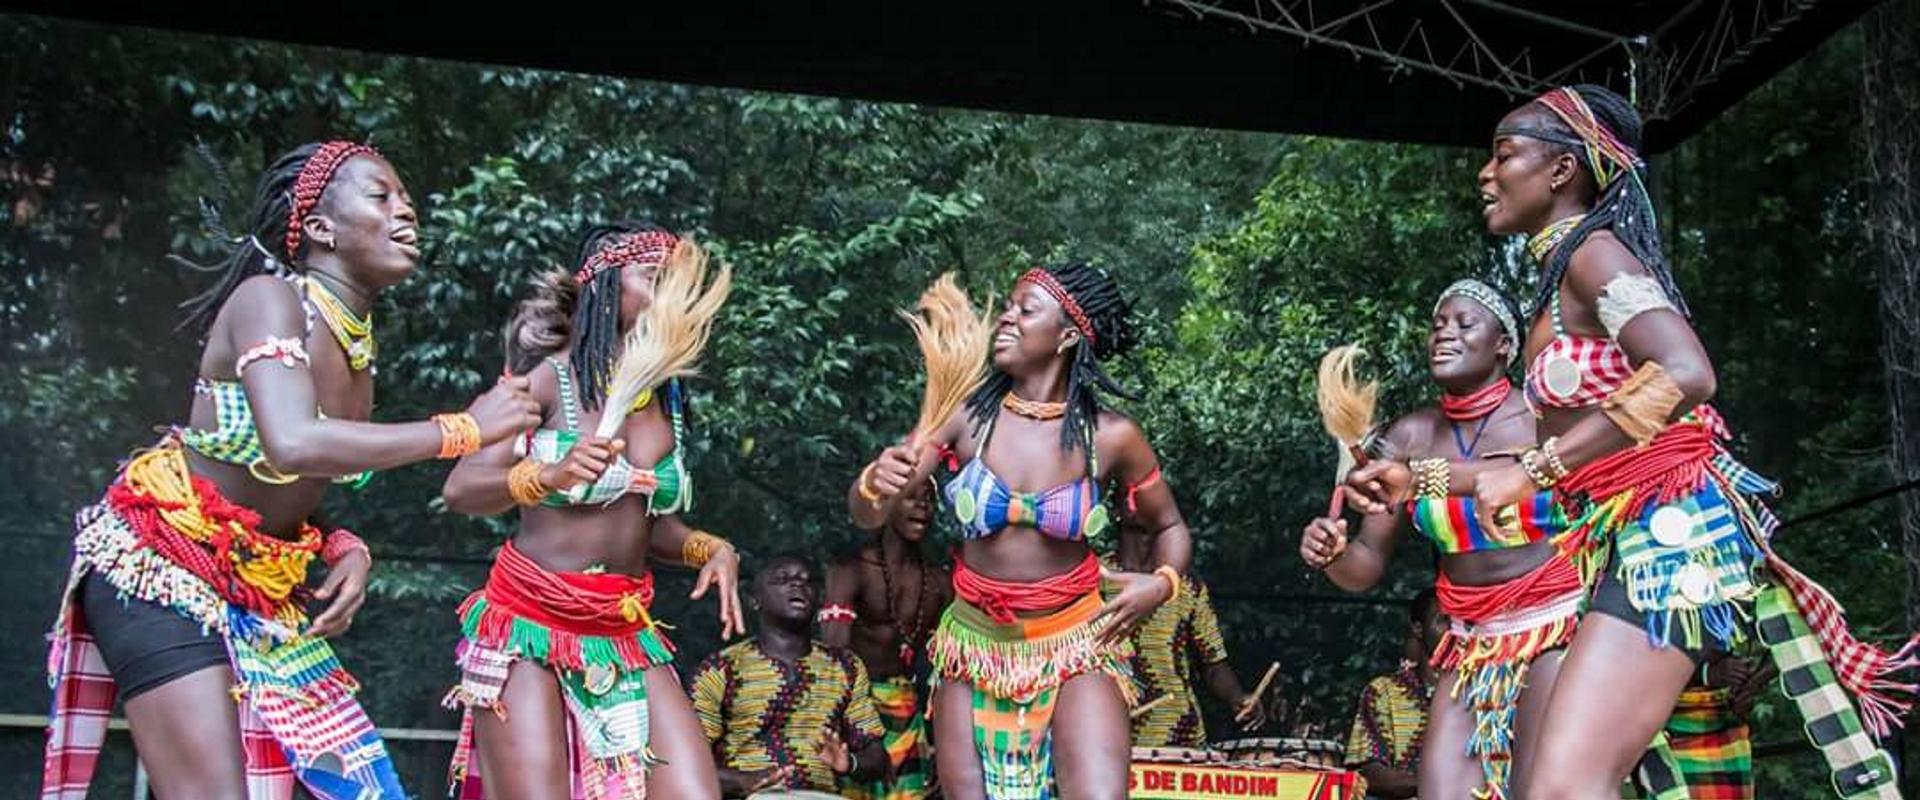 netos de bandim donne danza Guinea Bissau Mani Tese 2018